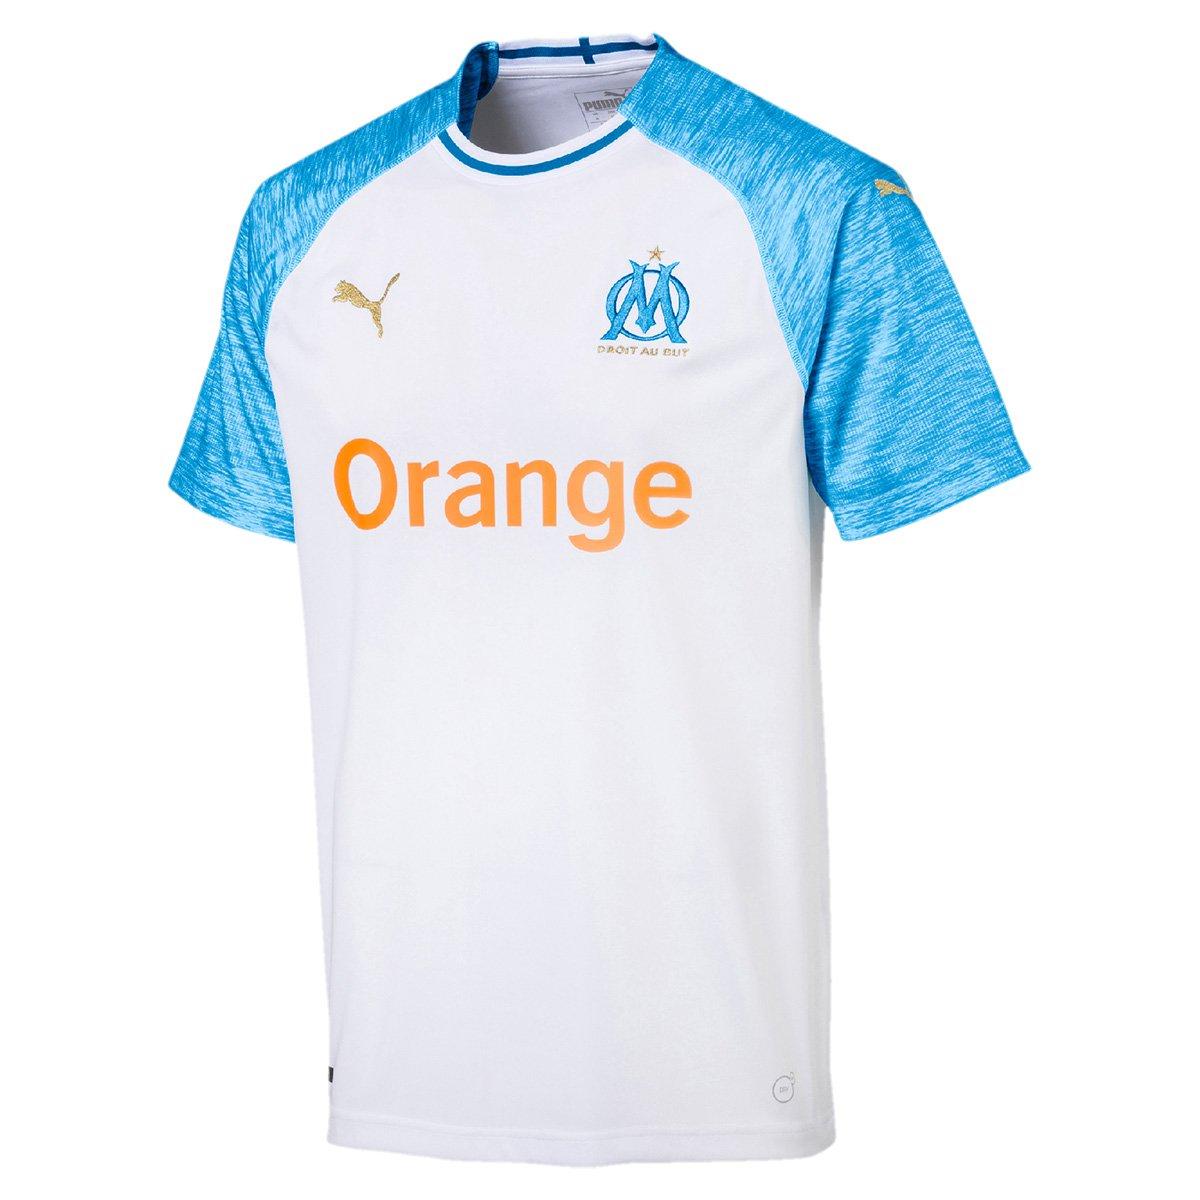 d4ecf3985 Camisa Olympique de Marseille Home 18/19 s/n° - Torcedor Puma Masculina